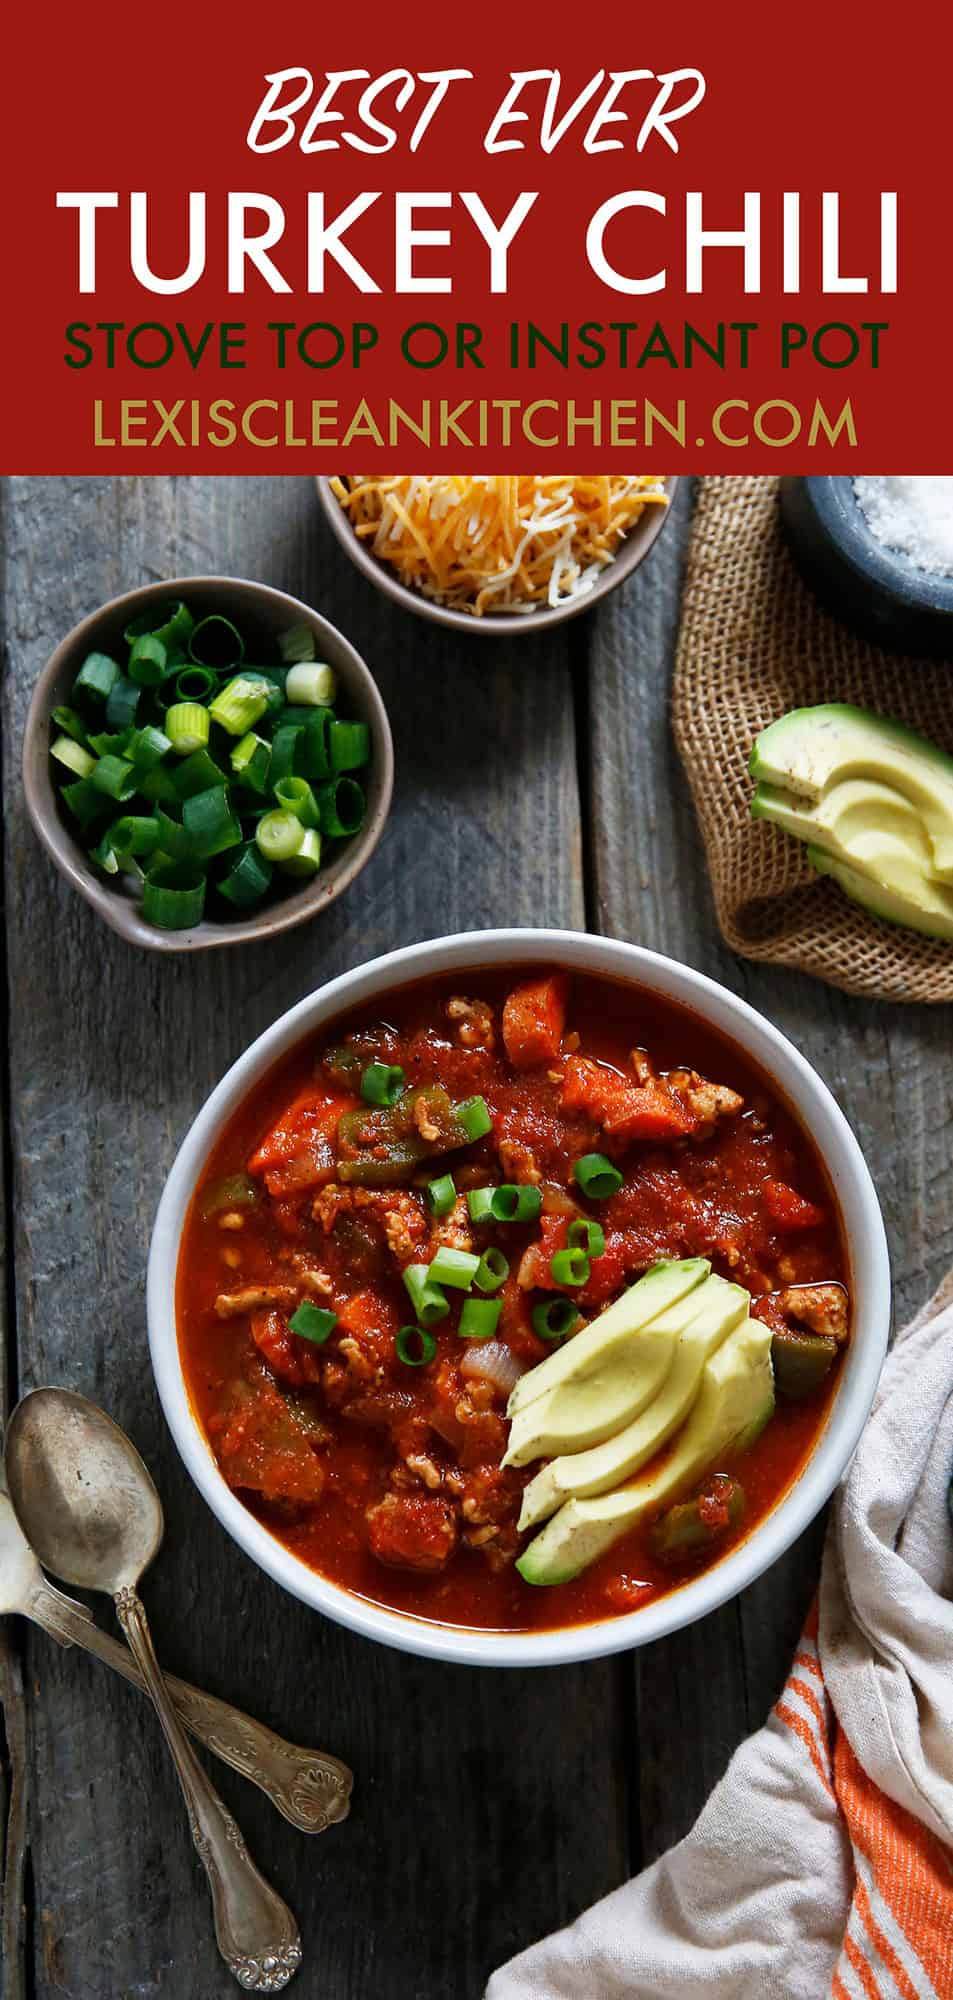 Healthier Classic Turkey Chili - Lexi's Clean Kitchen #turkey #chili #soup #intstantpot